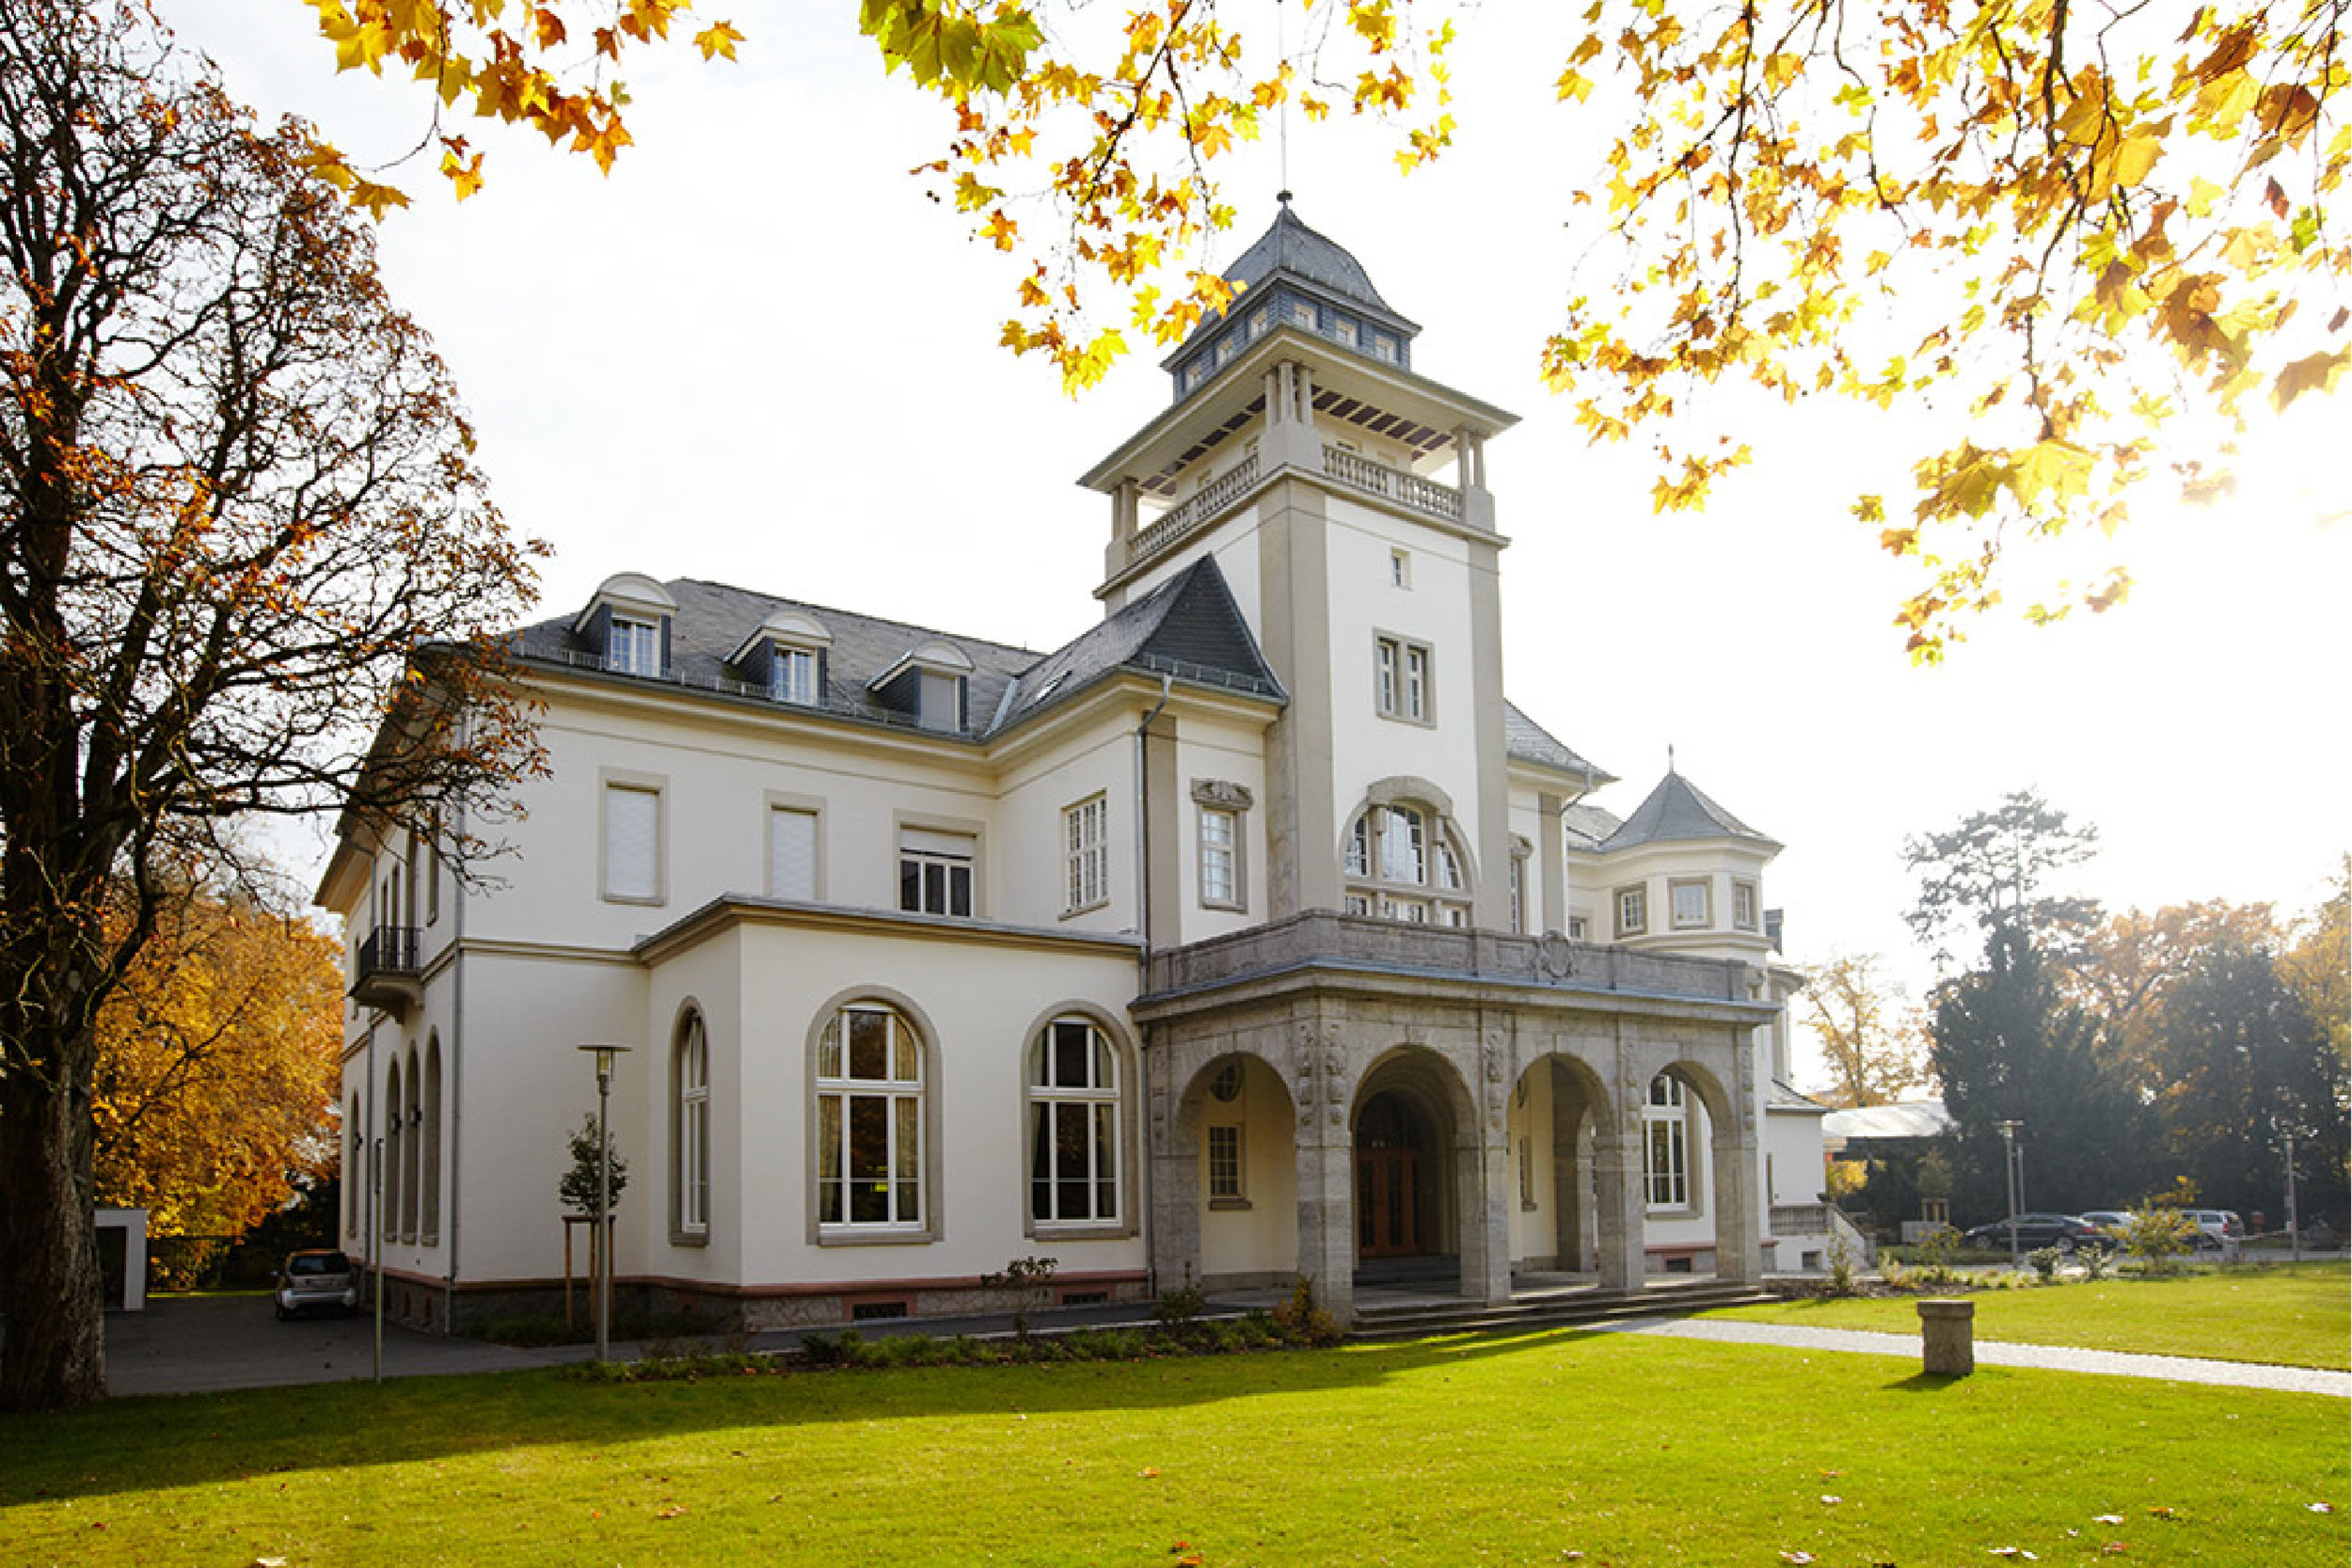 The Venue - The venue of the SynBio World Cafe is the prestigious Georg-Christoph-Lichtenberg-Haus, Dieburger Straße 241, 64287 Darmstadt.